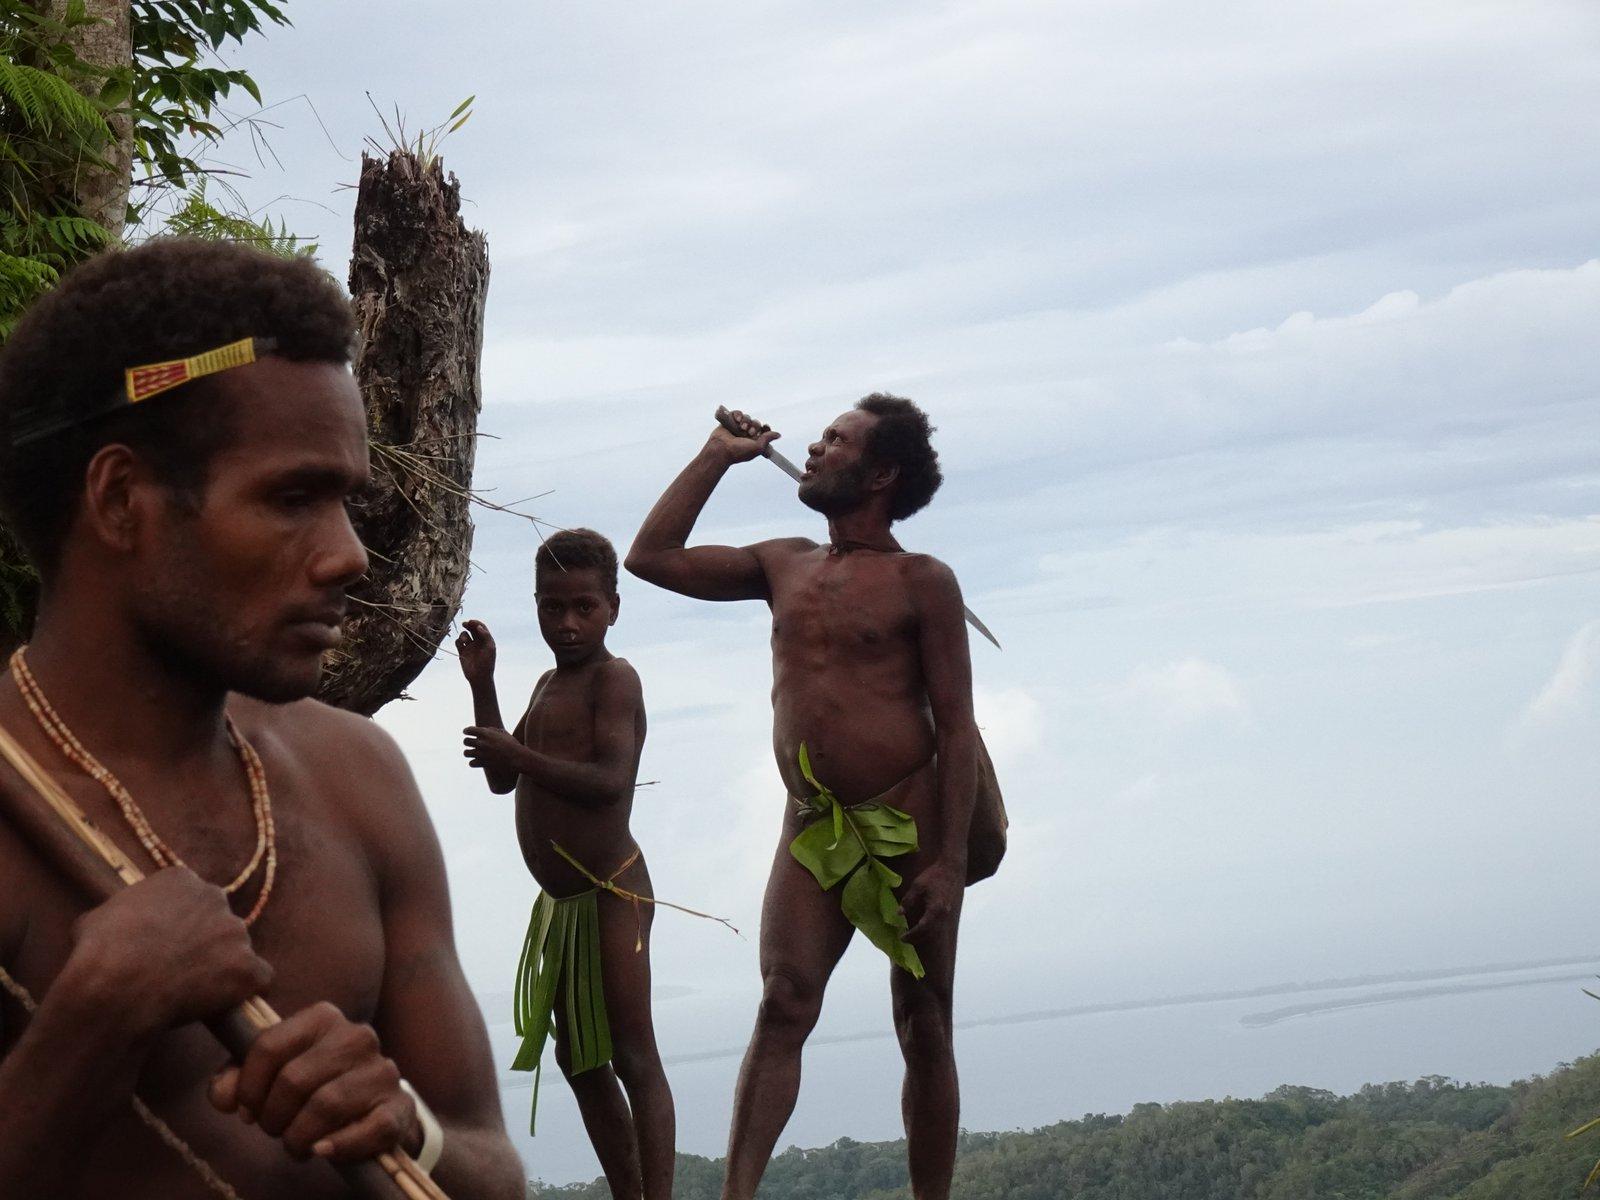 Members of the Kwaio community, Malaita, Solomon Islands